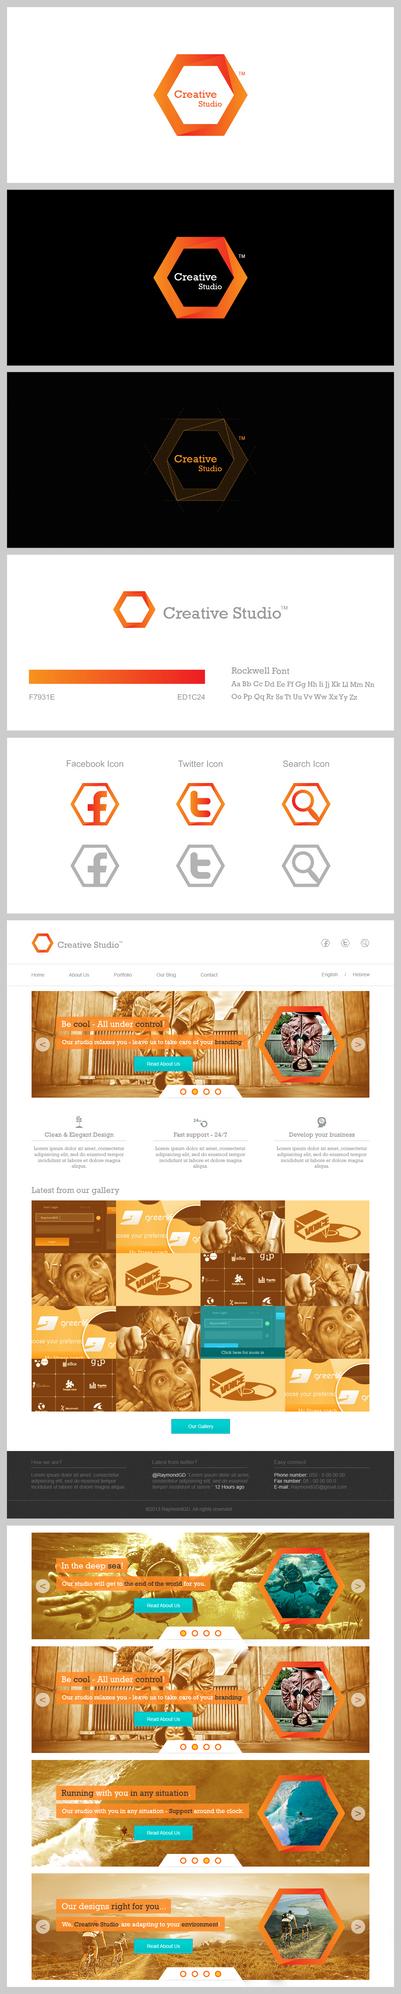 Creative Studio - New branding project!